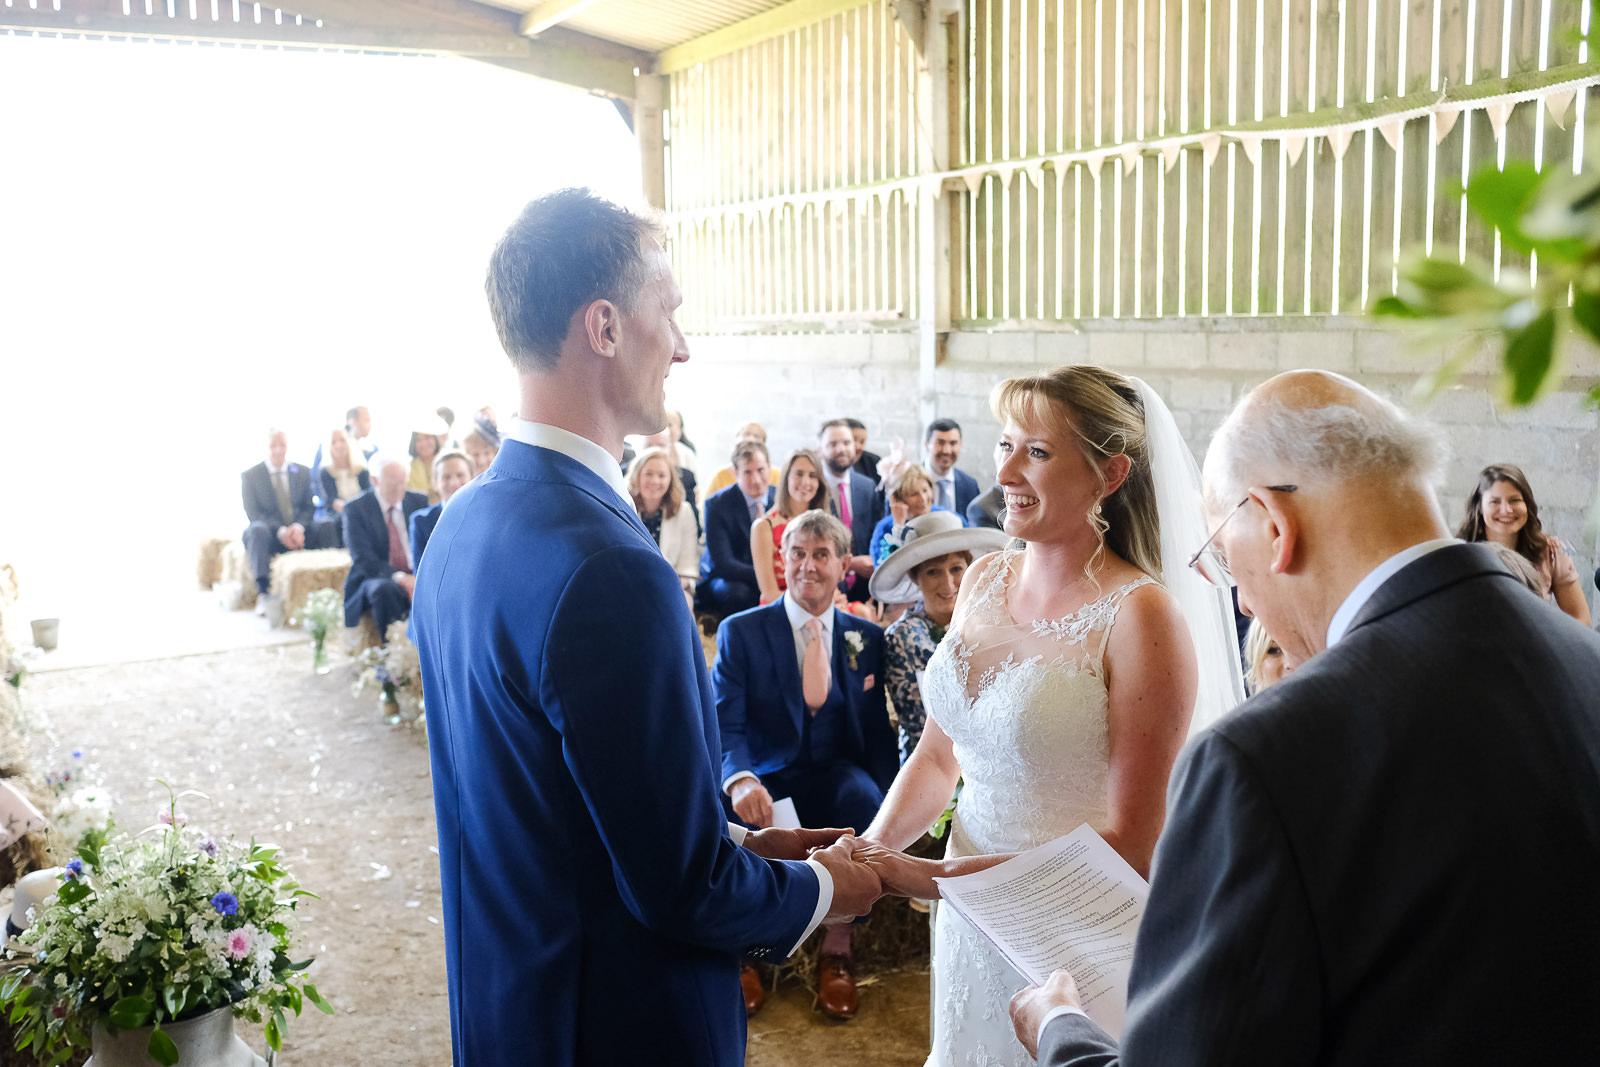 Roscarrock Farm wedding in Cornwall 033.jpg